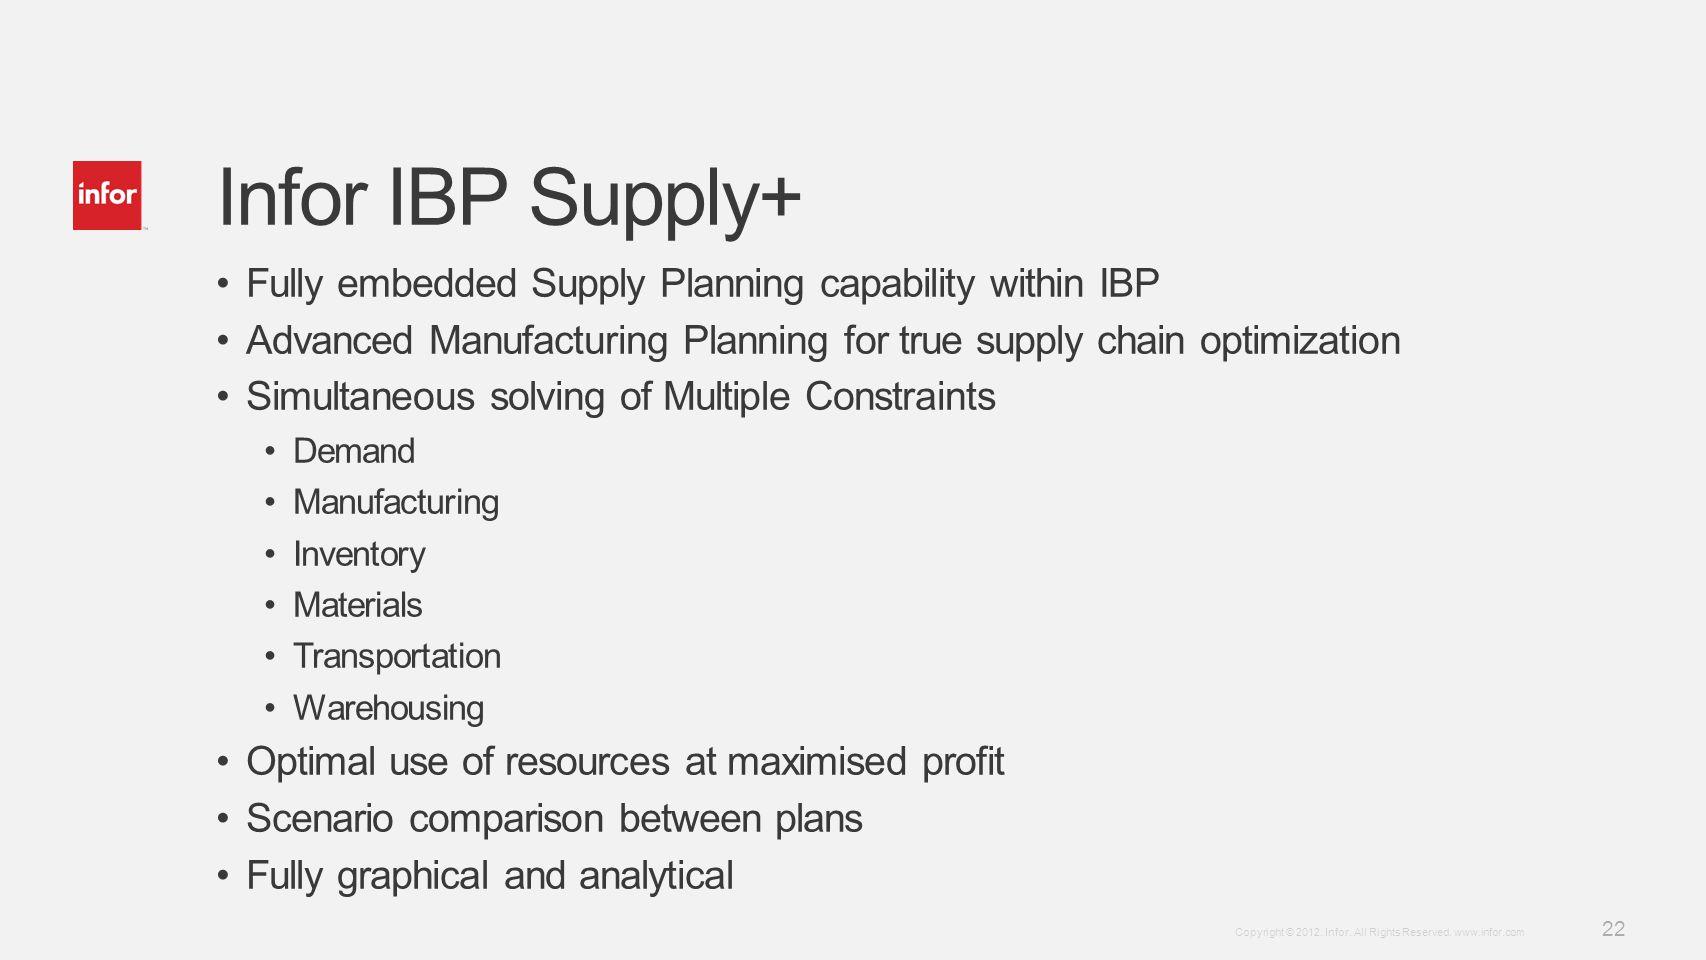 Template v4 September 27, 2012 22 Copyright © 2012. Infor. All Rights Reserved. www.infor.com Infor IBP Supply+ Fully embedded Supply Planning capabil